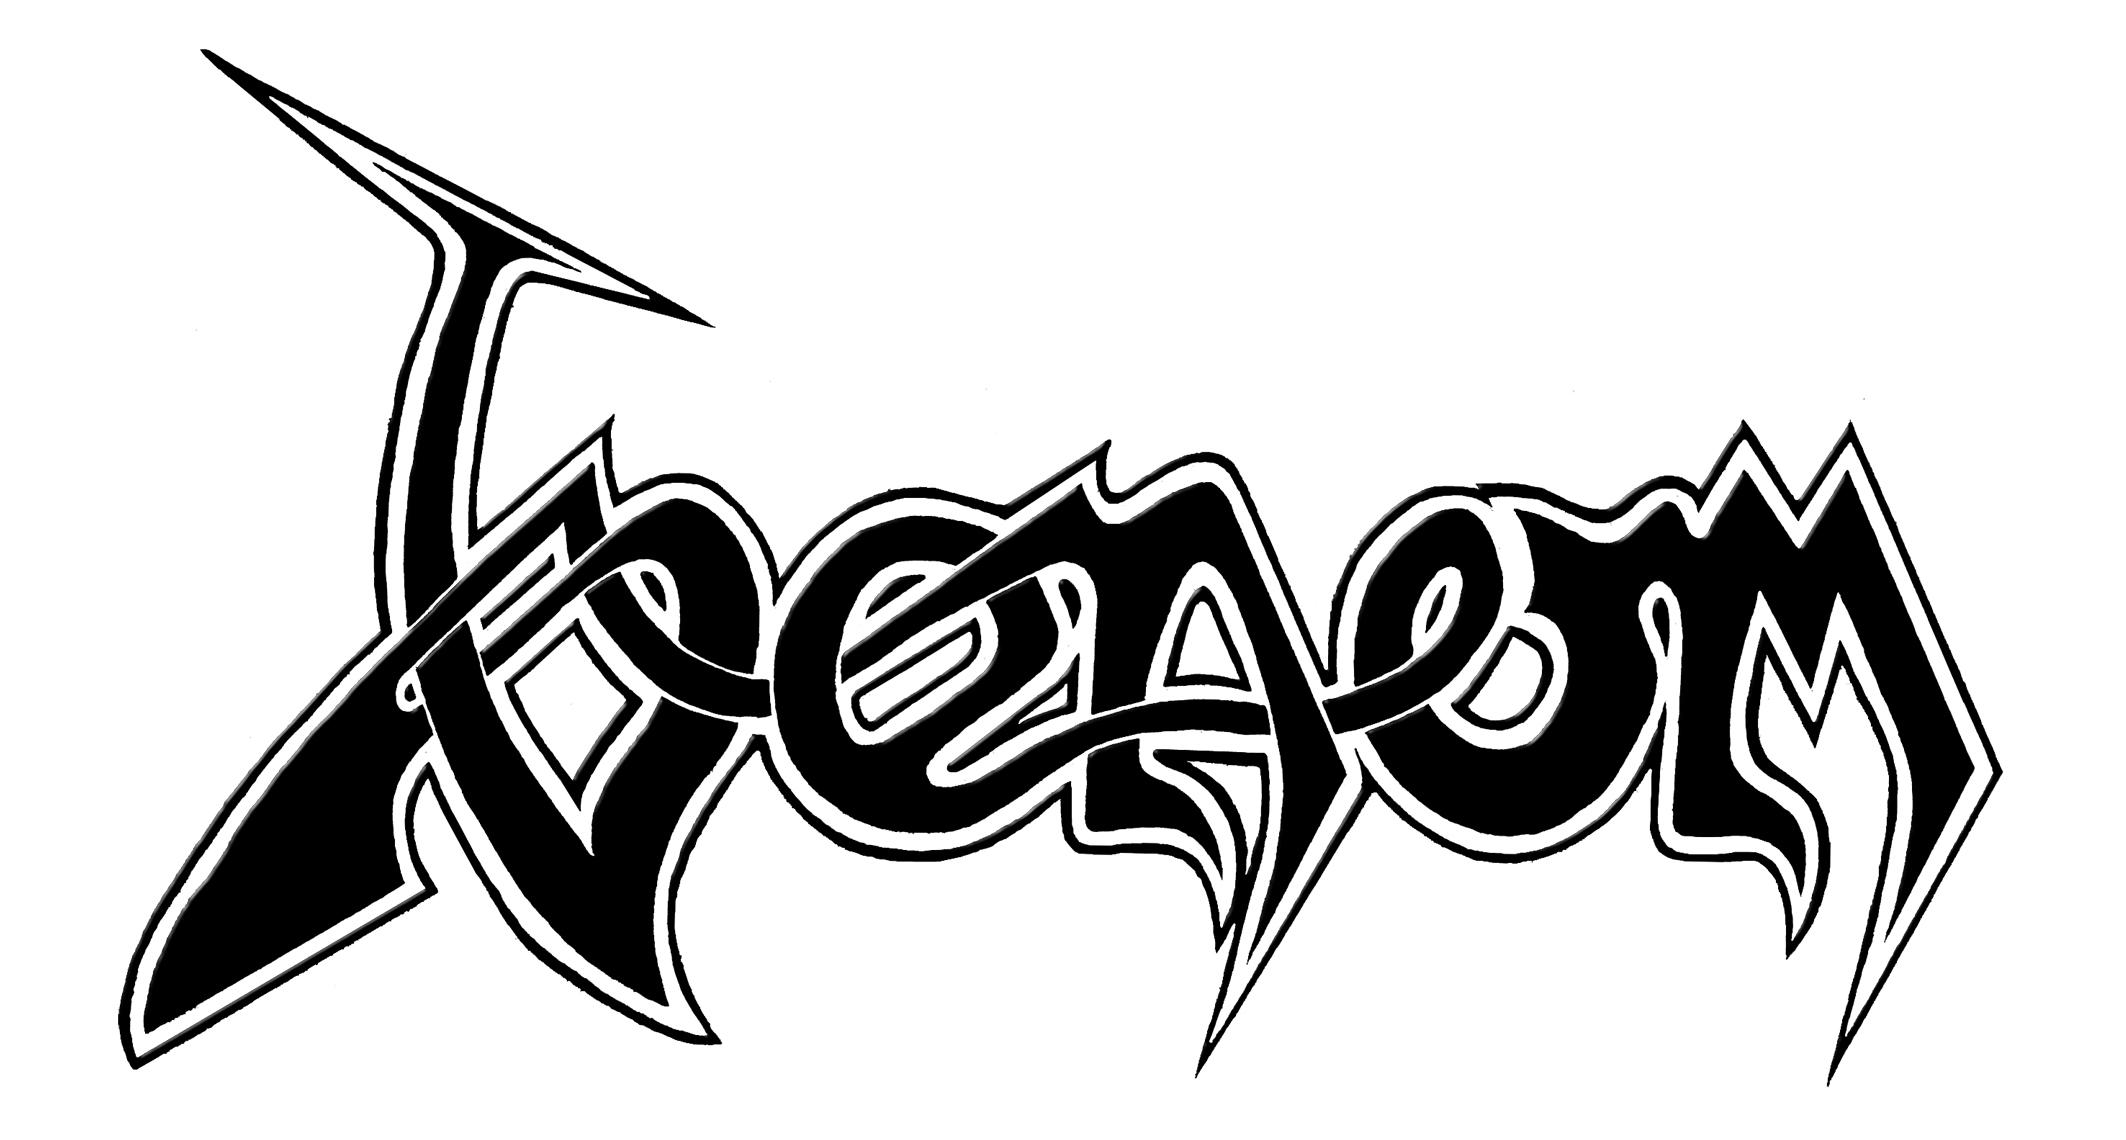 Venom Logos.